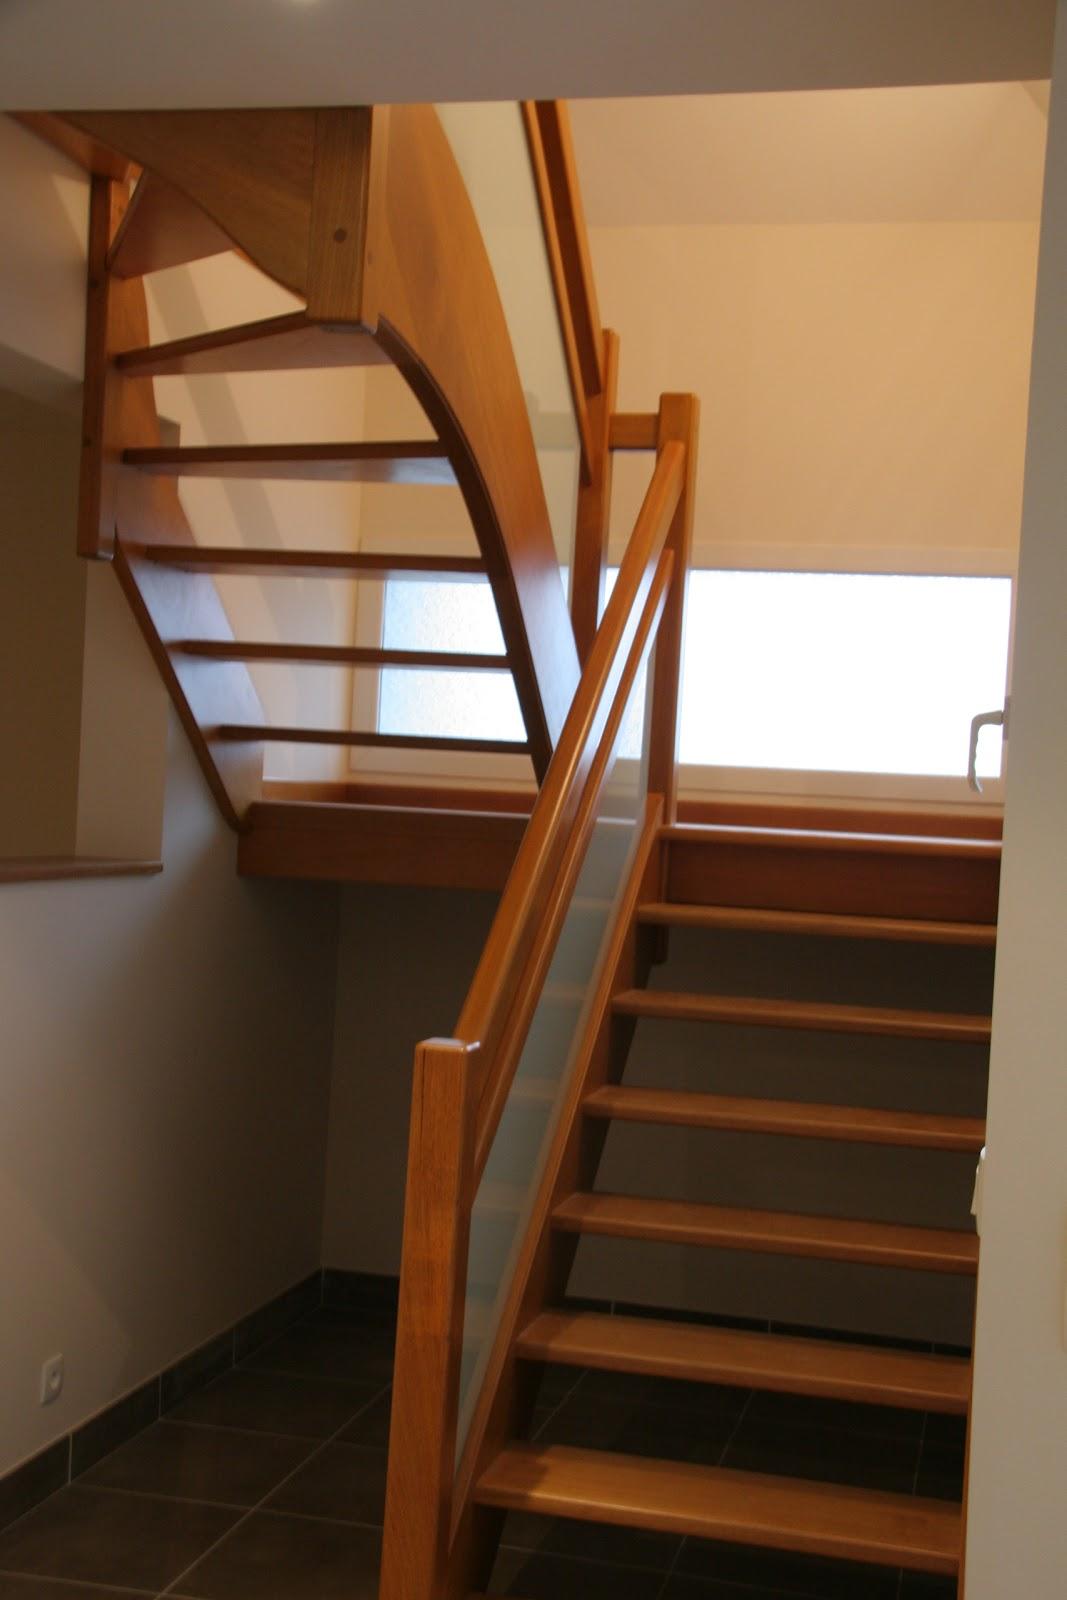 Escaliersbois64800 escalier avec palier intermaidiaire for Escalier avec palier intermediaire